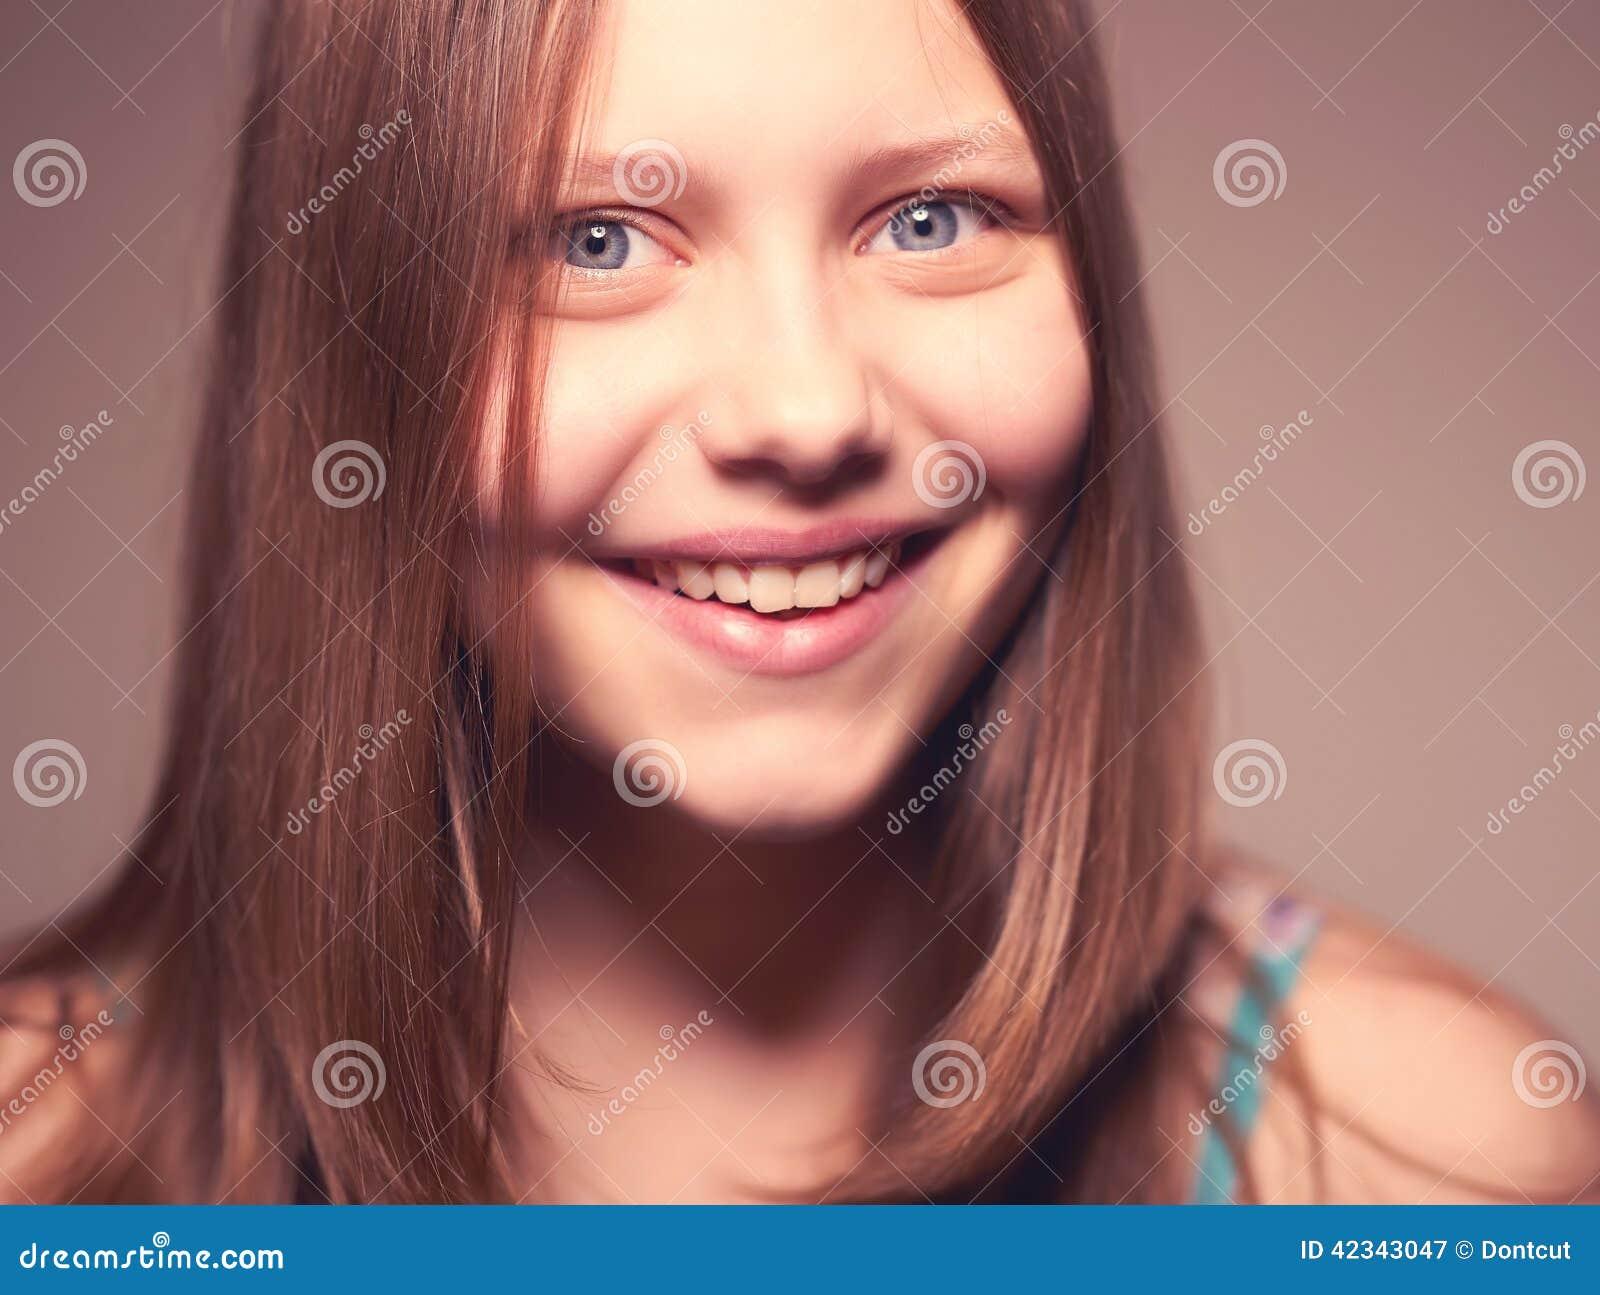 Cute Teen Girl Laughing Stock Photo Image 42343047